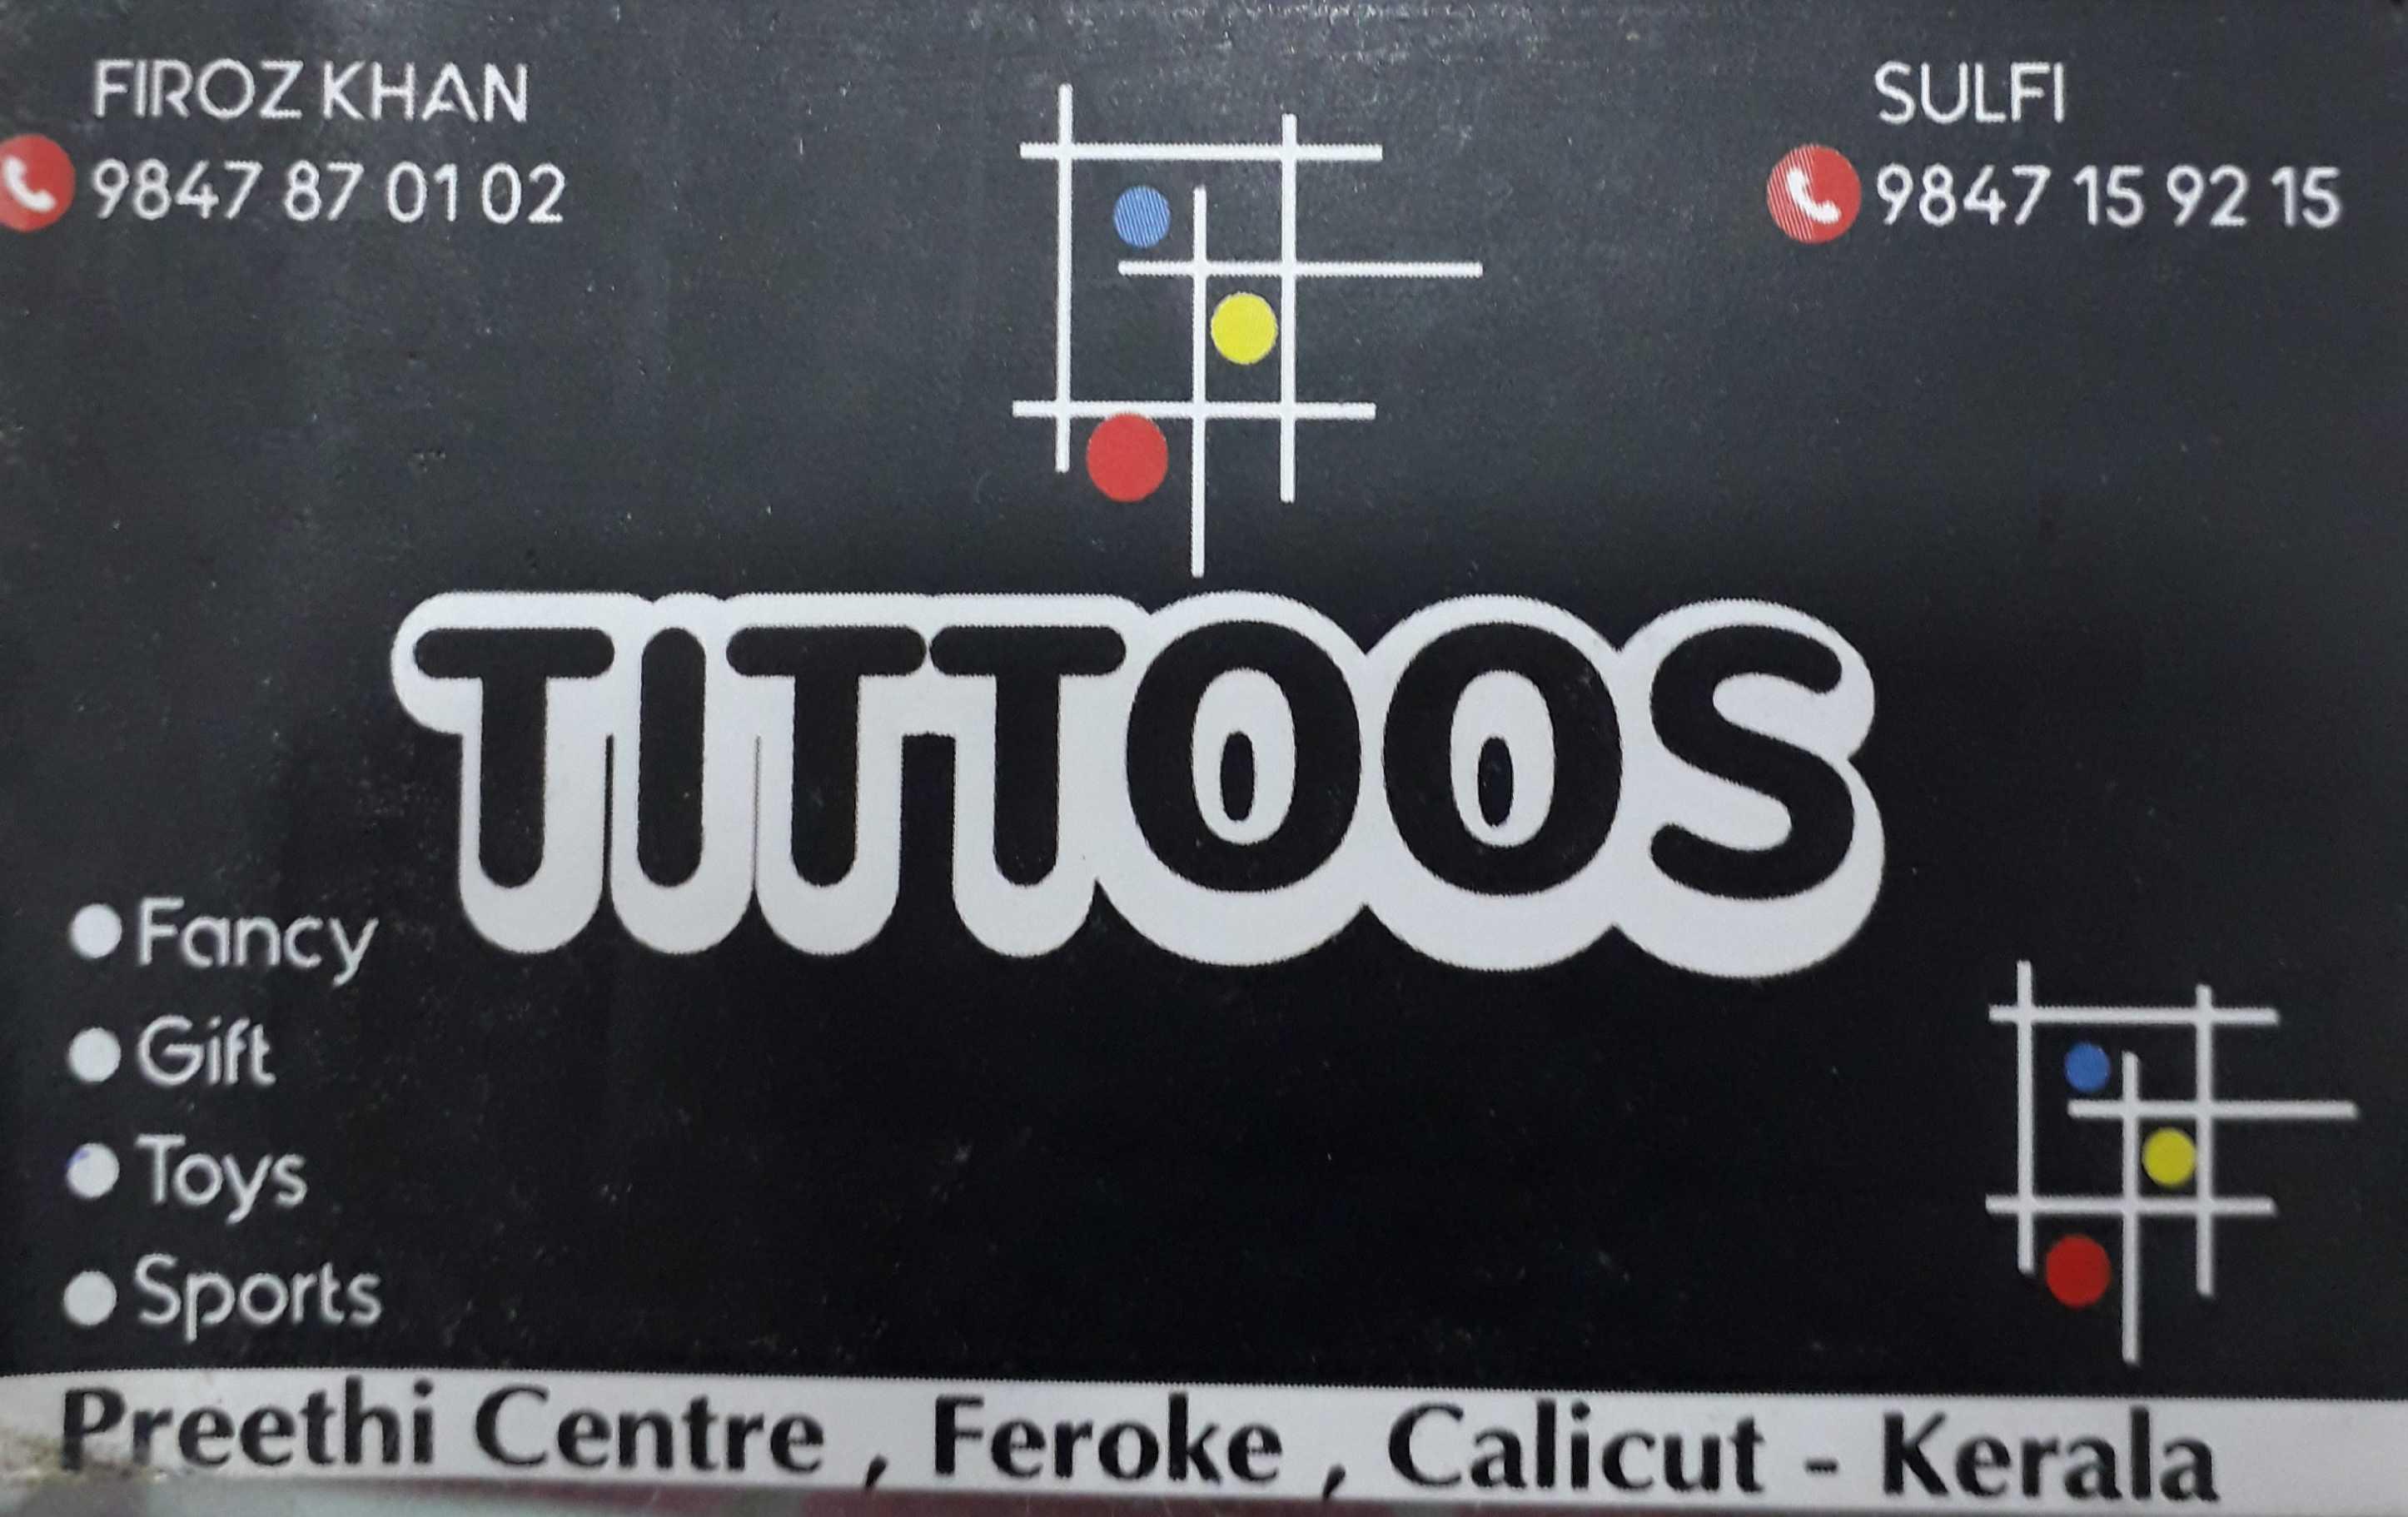 TITTOOS gift & toys, GIFT & TOYS,  service in Farook, Kozhikode